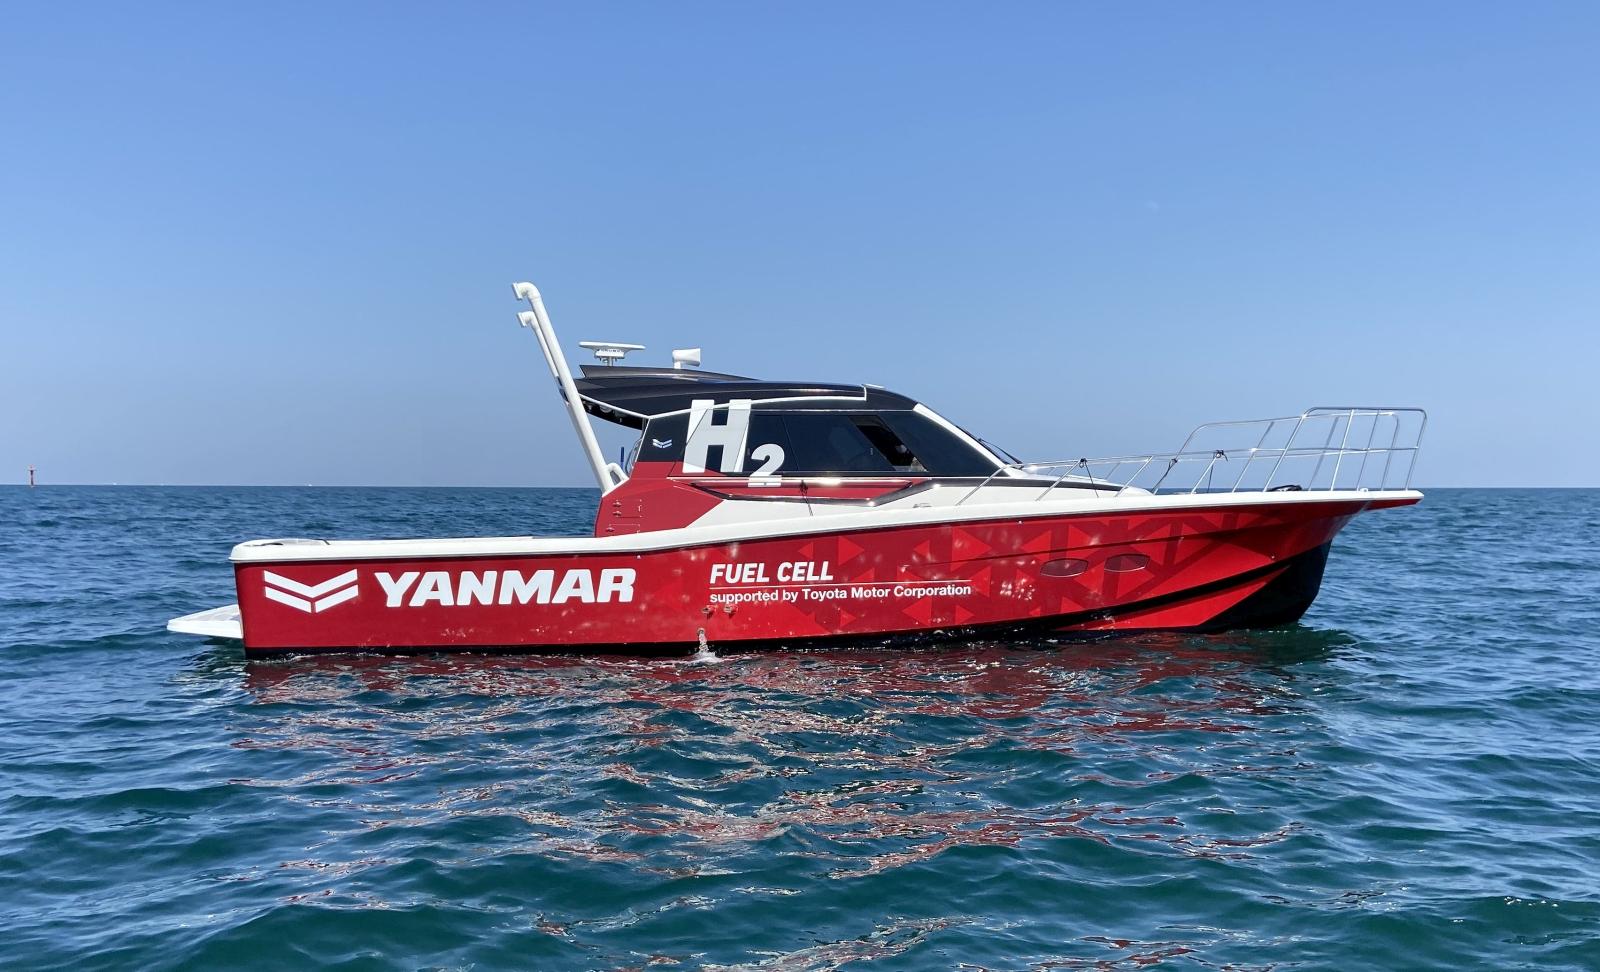 Yanmar kishajó